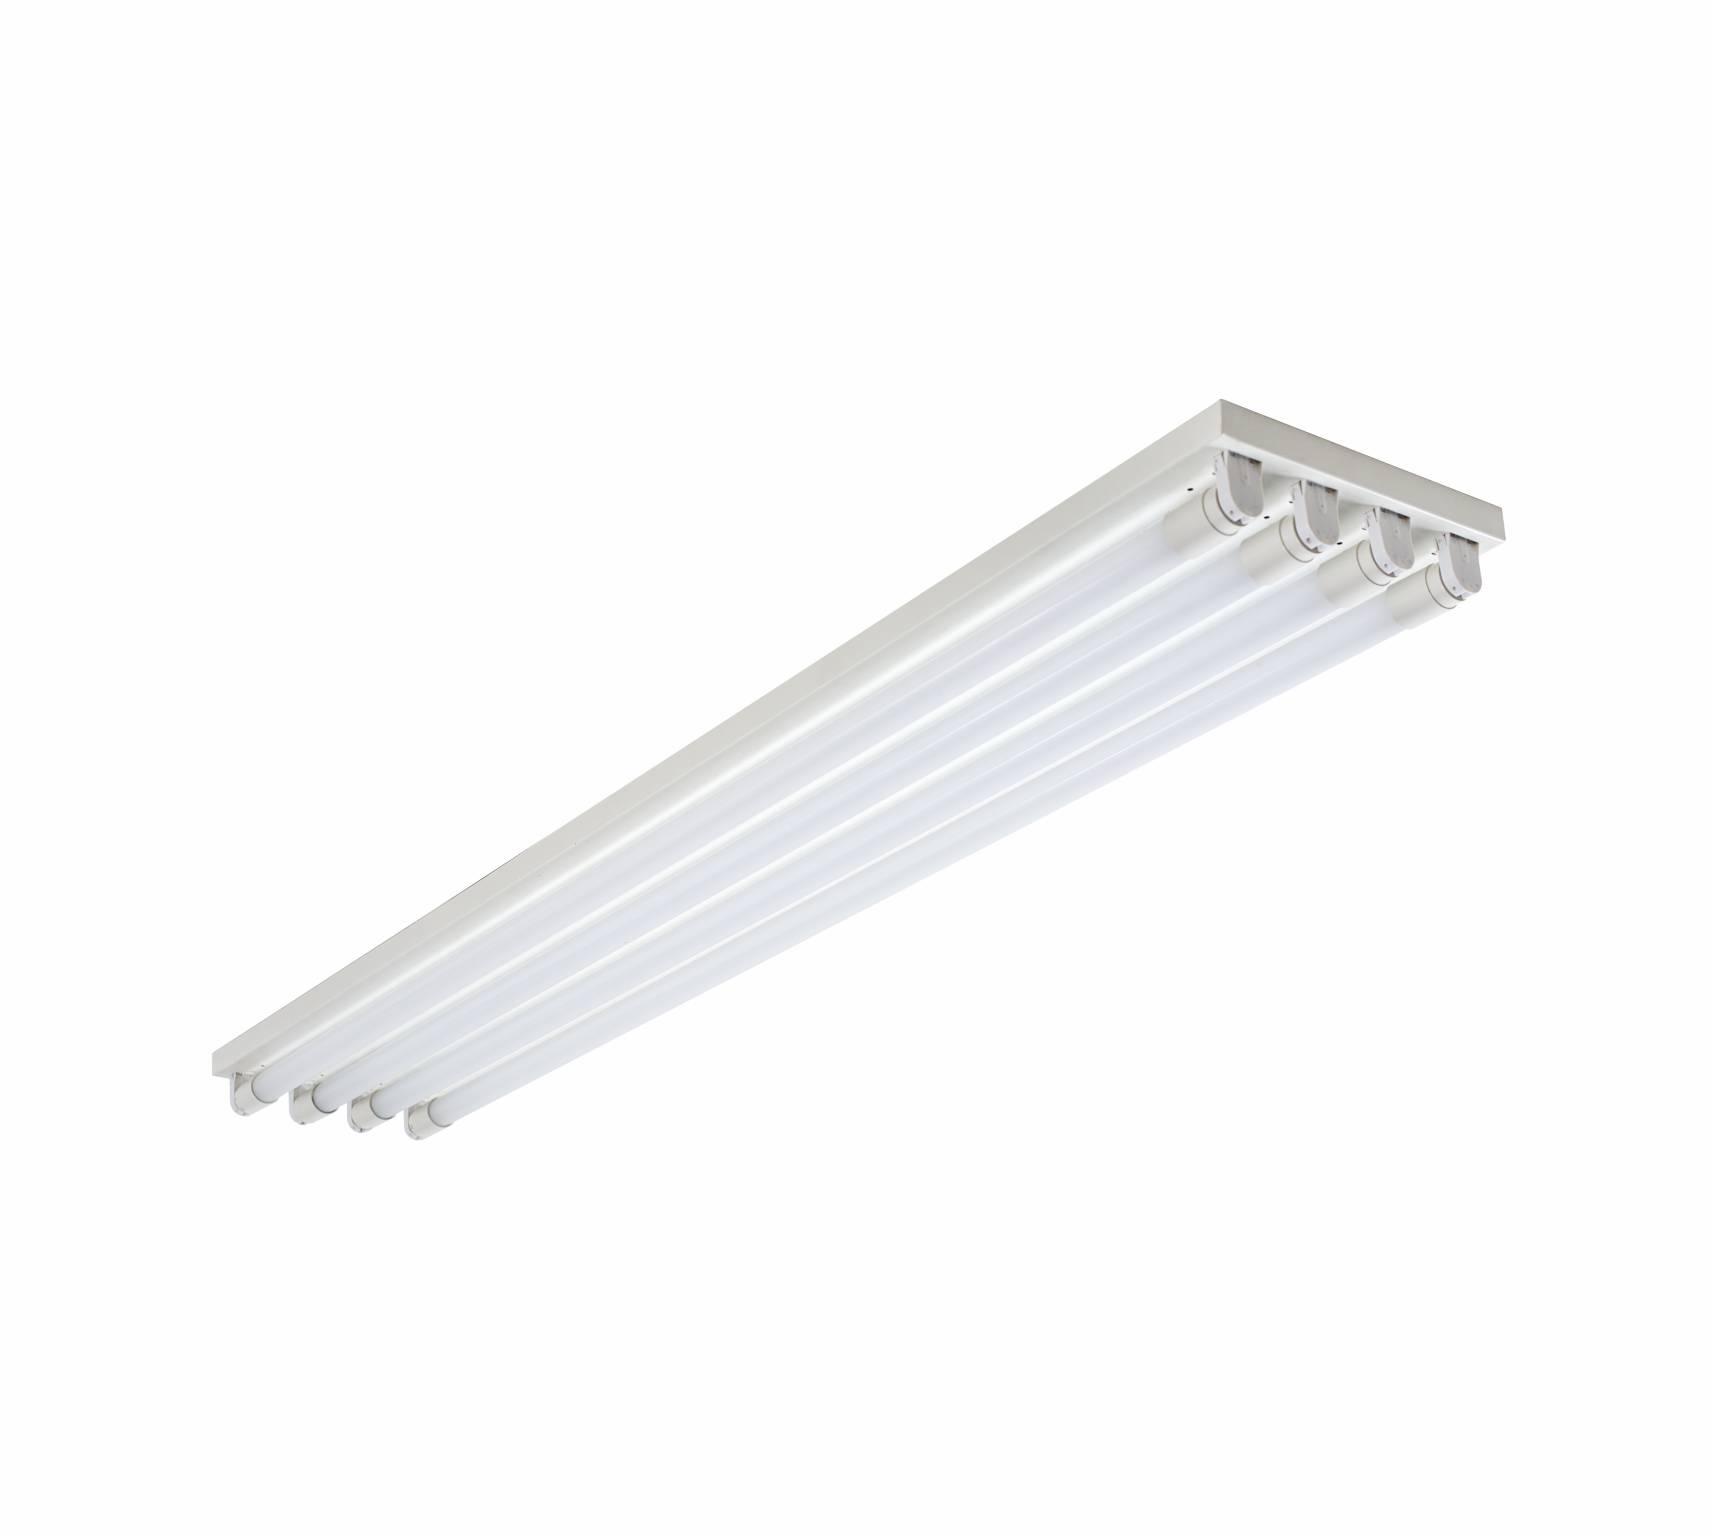 SLIMT8-LED-4X20-65-3C <span>(caixa)</span><br/>